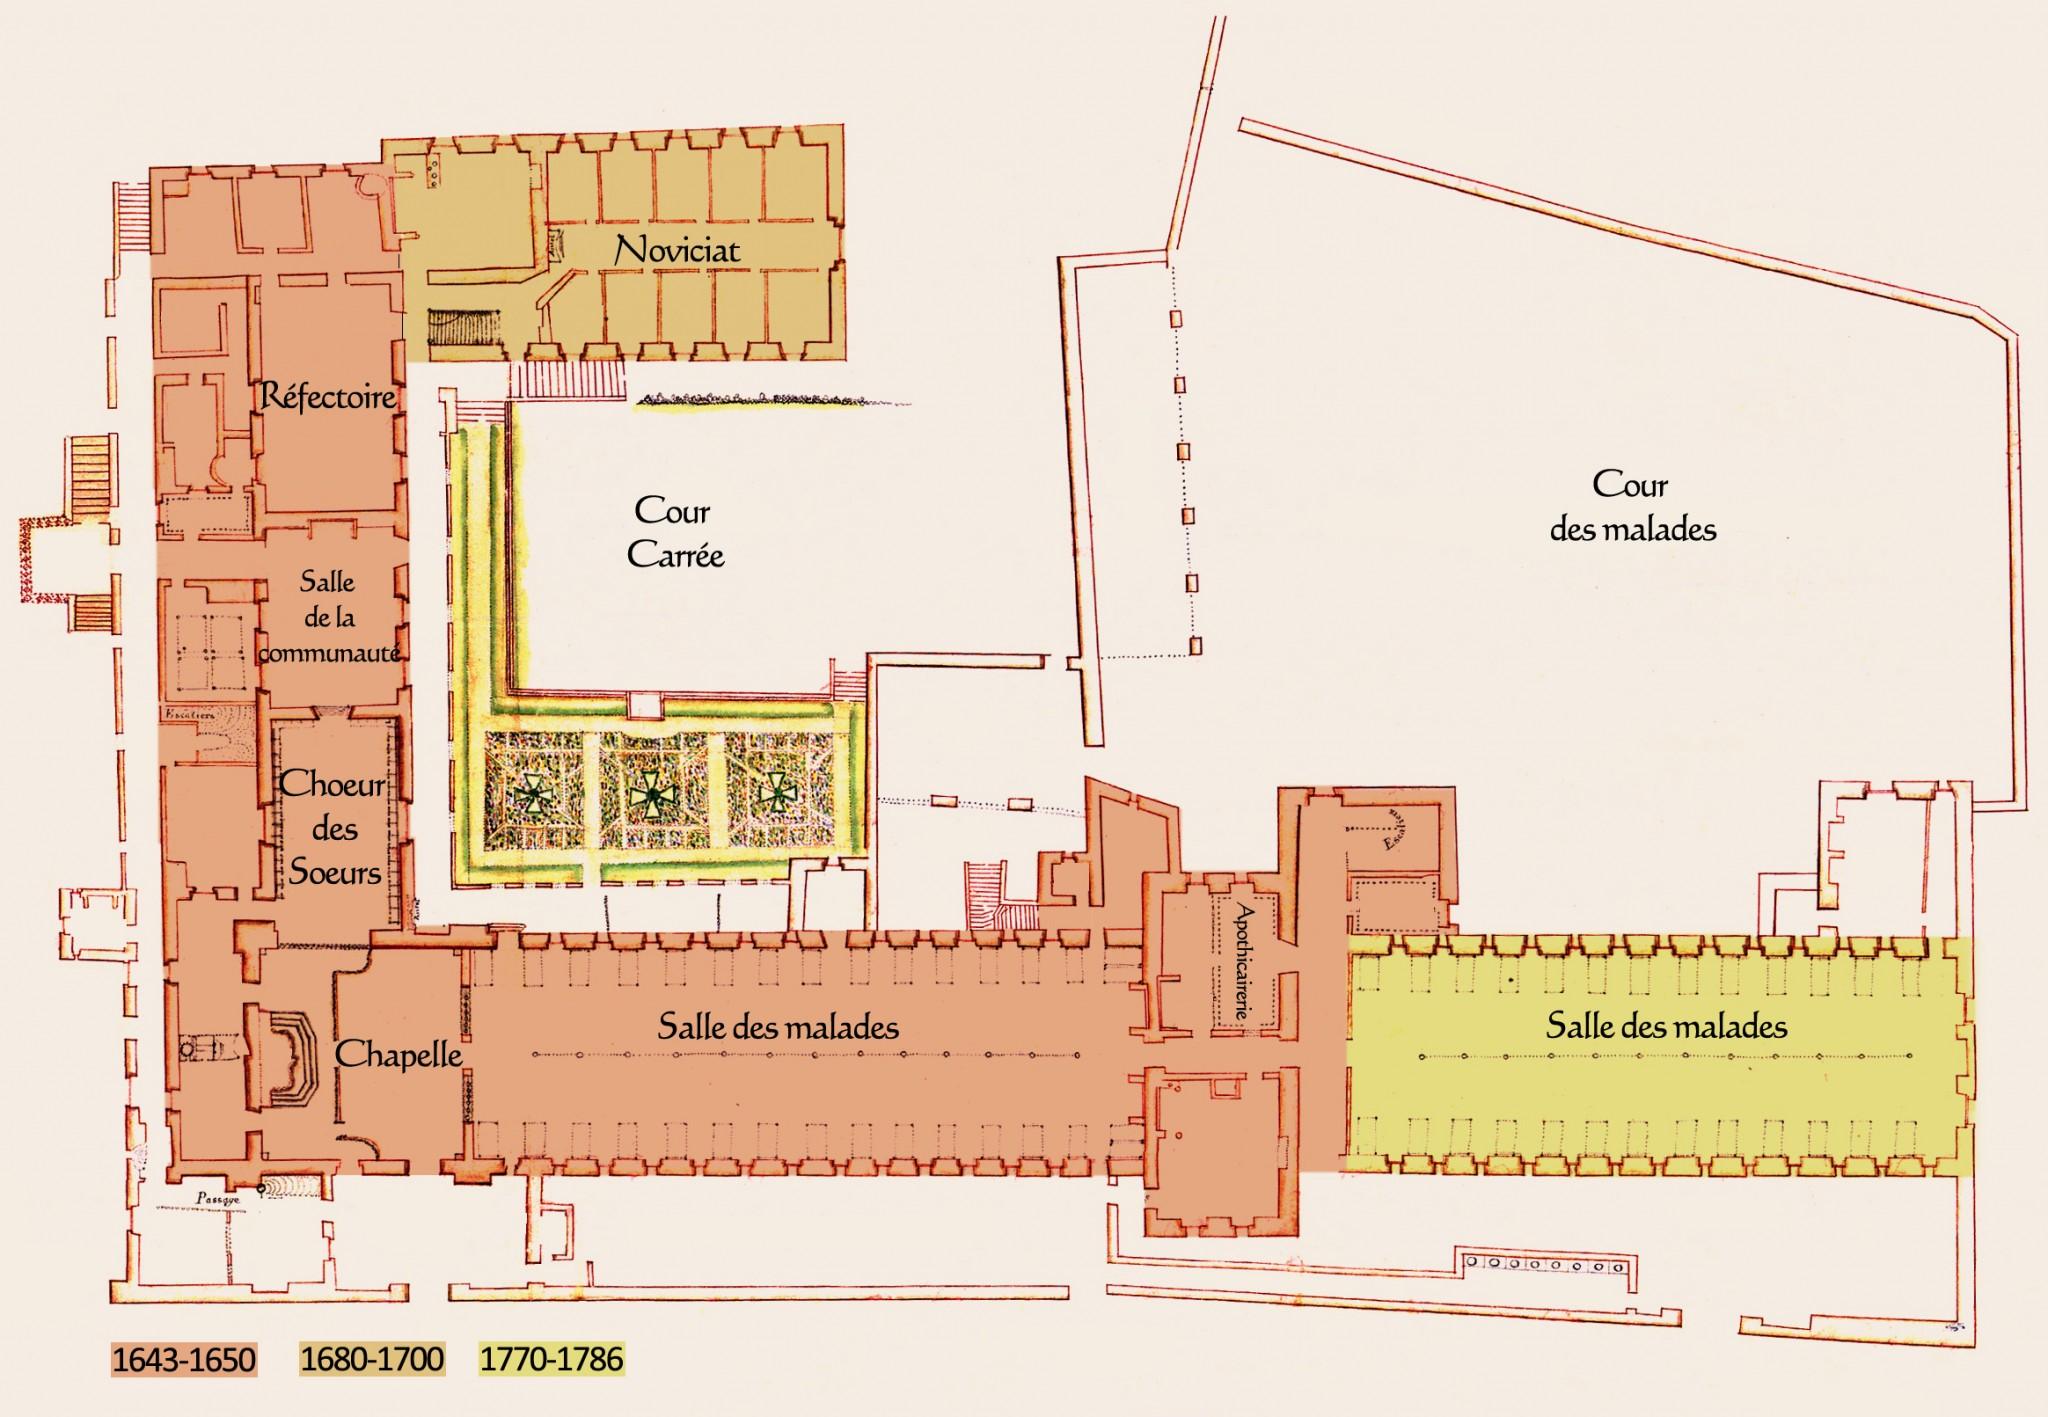 Un peu d'histoire de l'Hôtel-Dieu de Baugé